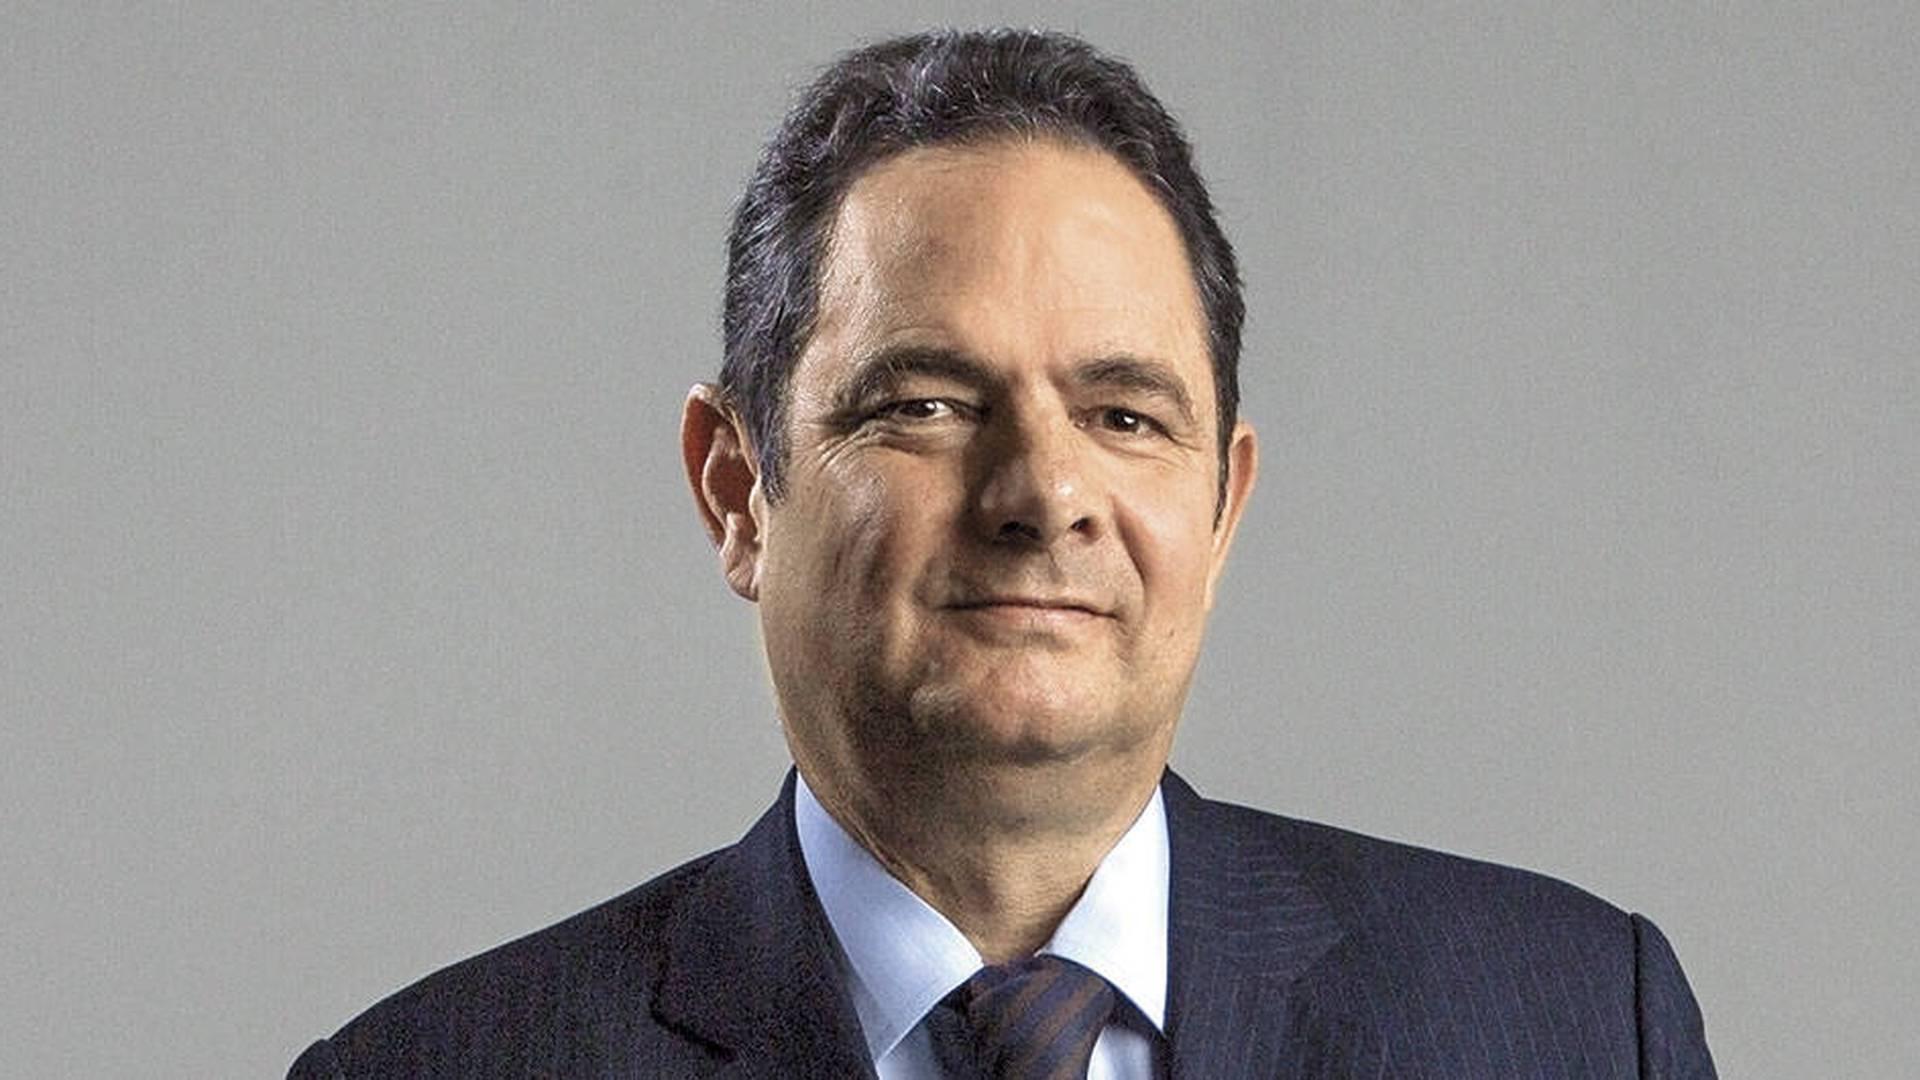 Germán Vargas